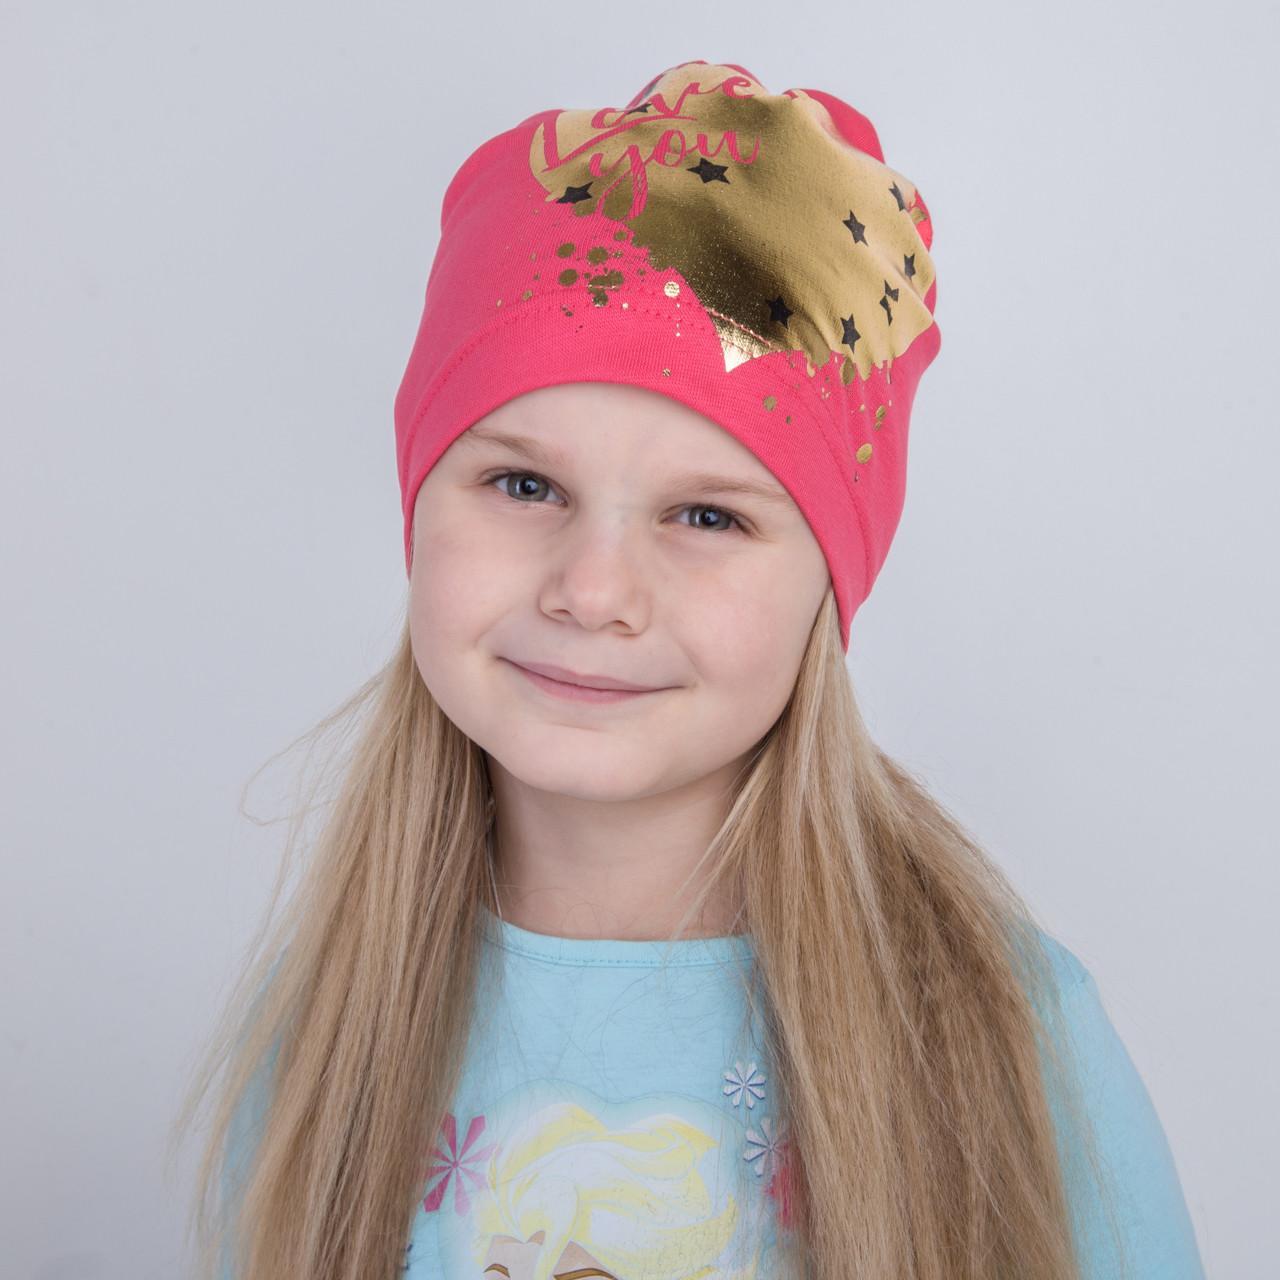 Стильная весенняя шапка для девочки - Love You - Артикул 2216